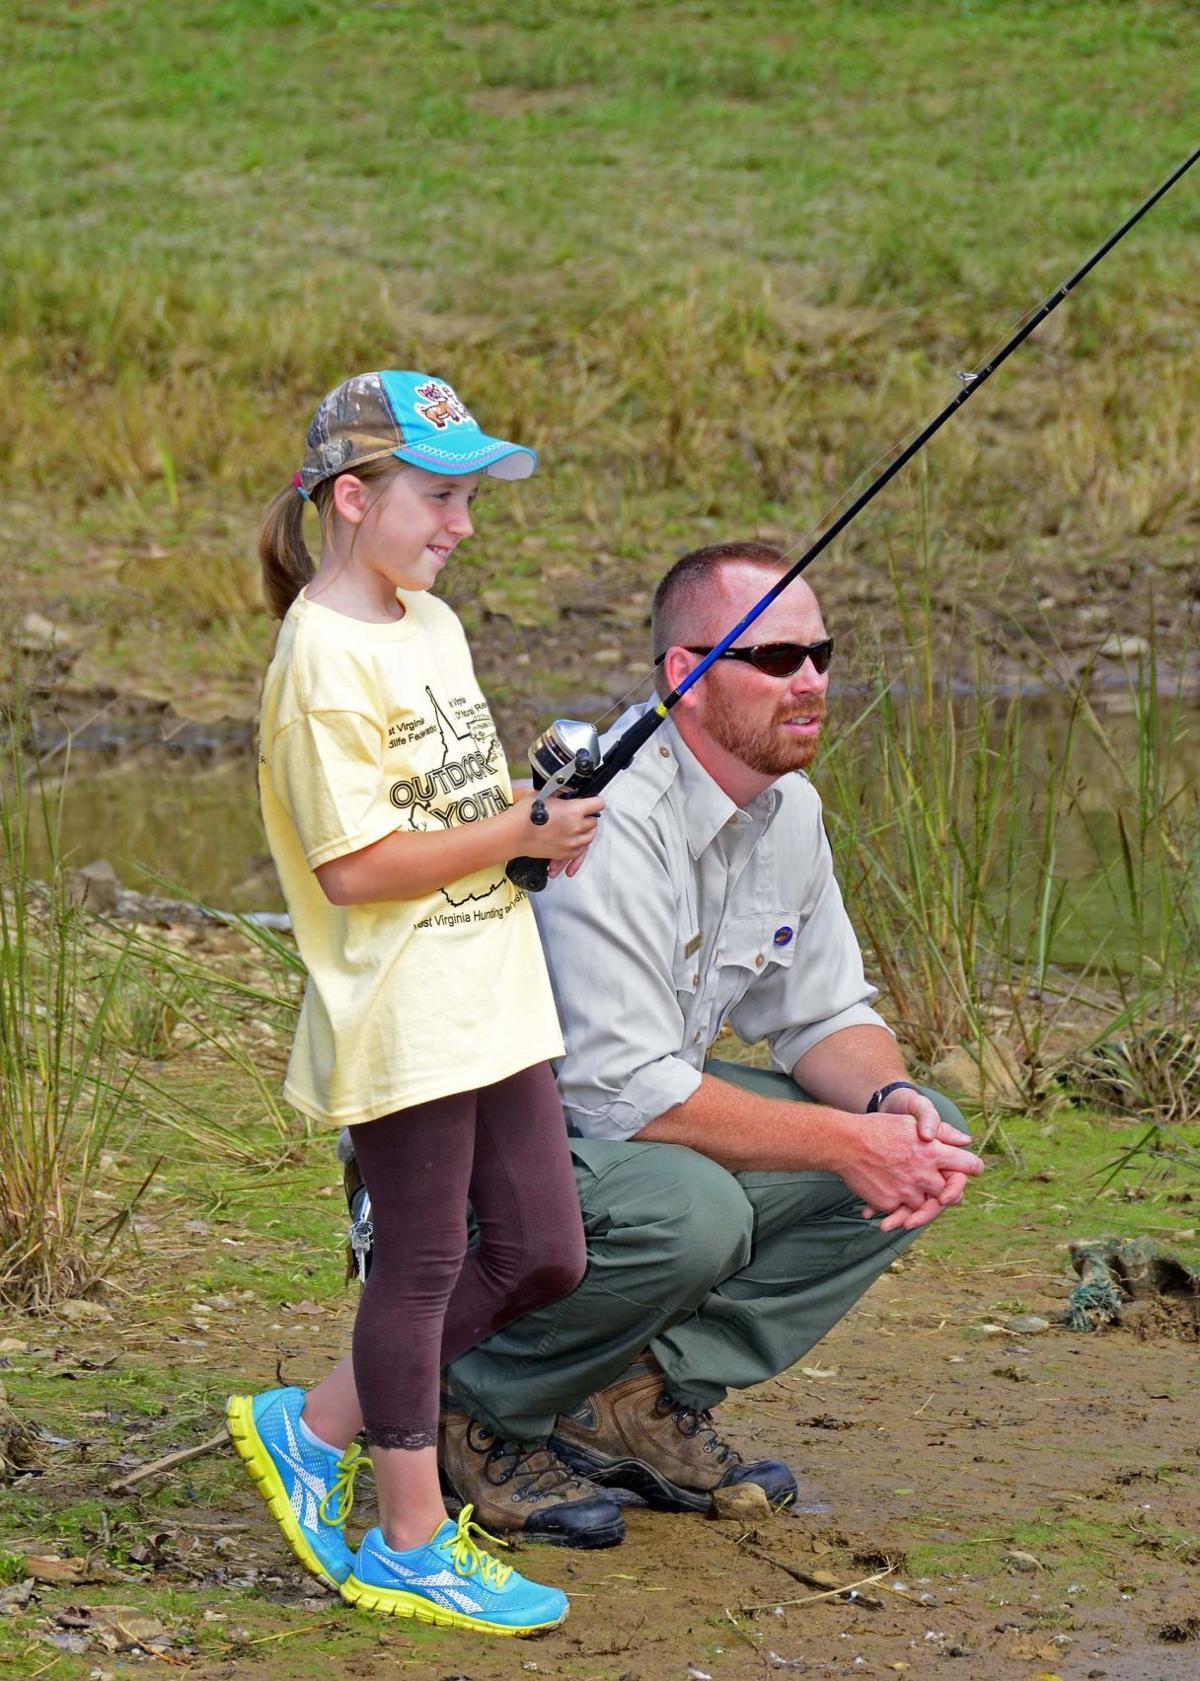 Celebrated archer to headline W.Va.'s celebration of hunting, fishing